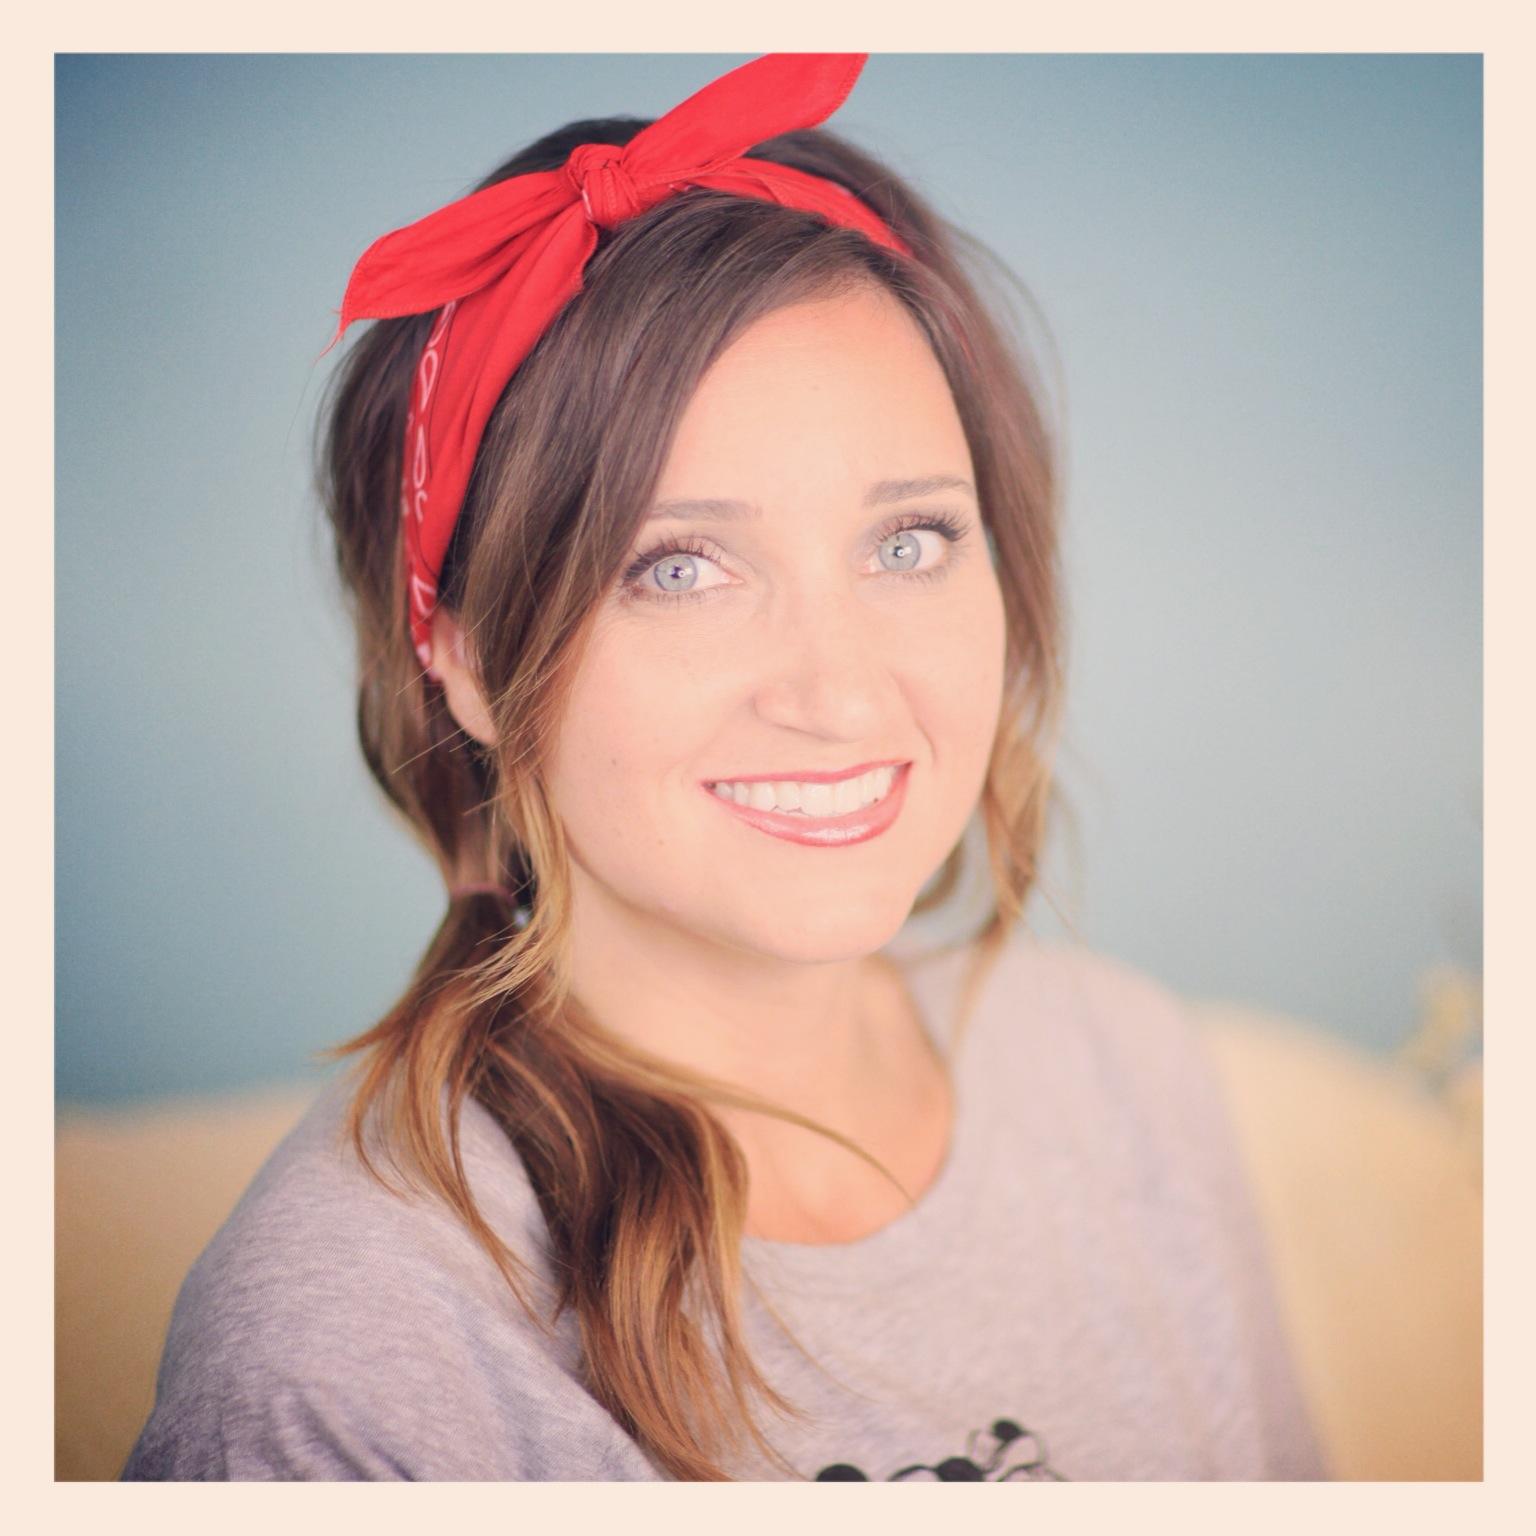 Girl Hairstyle Download Video: Free Photo: Woman Wearing Headband